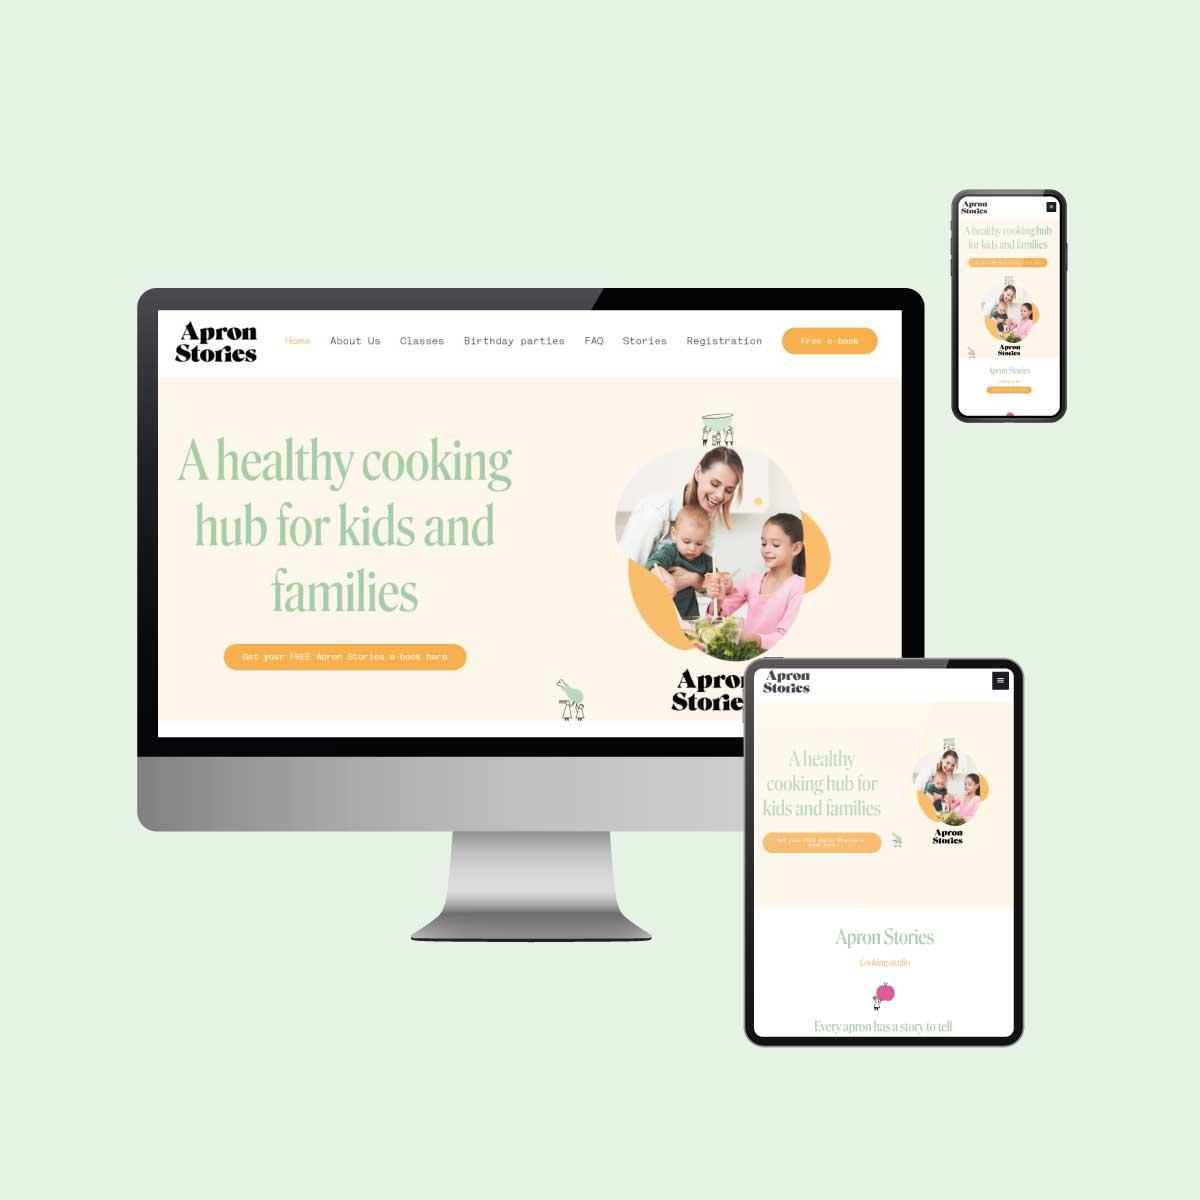 Apron Stories website